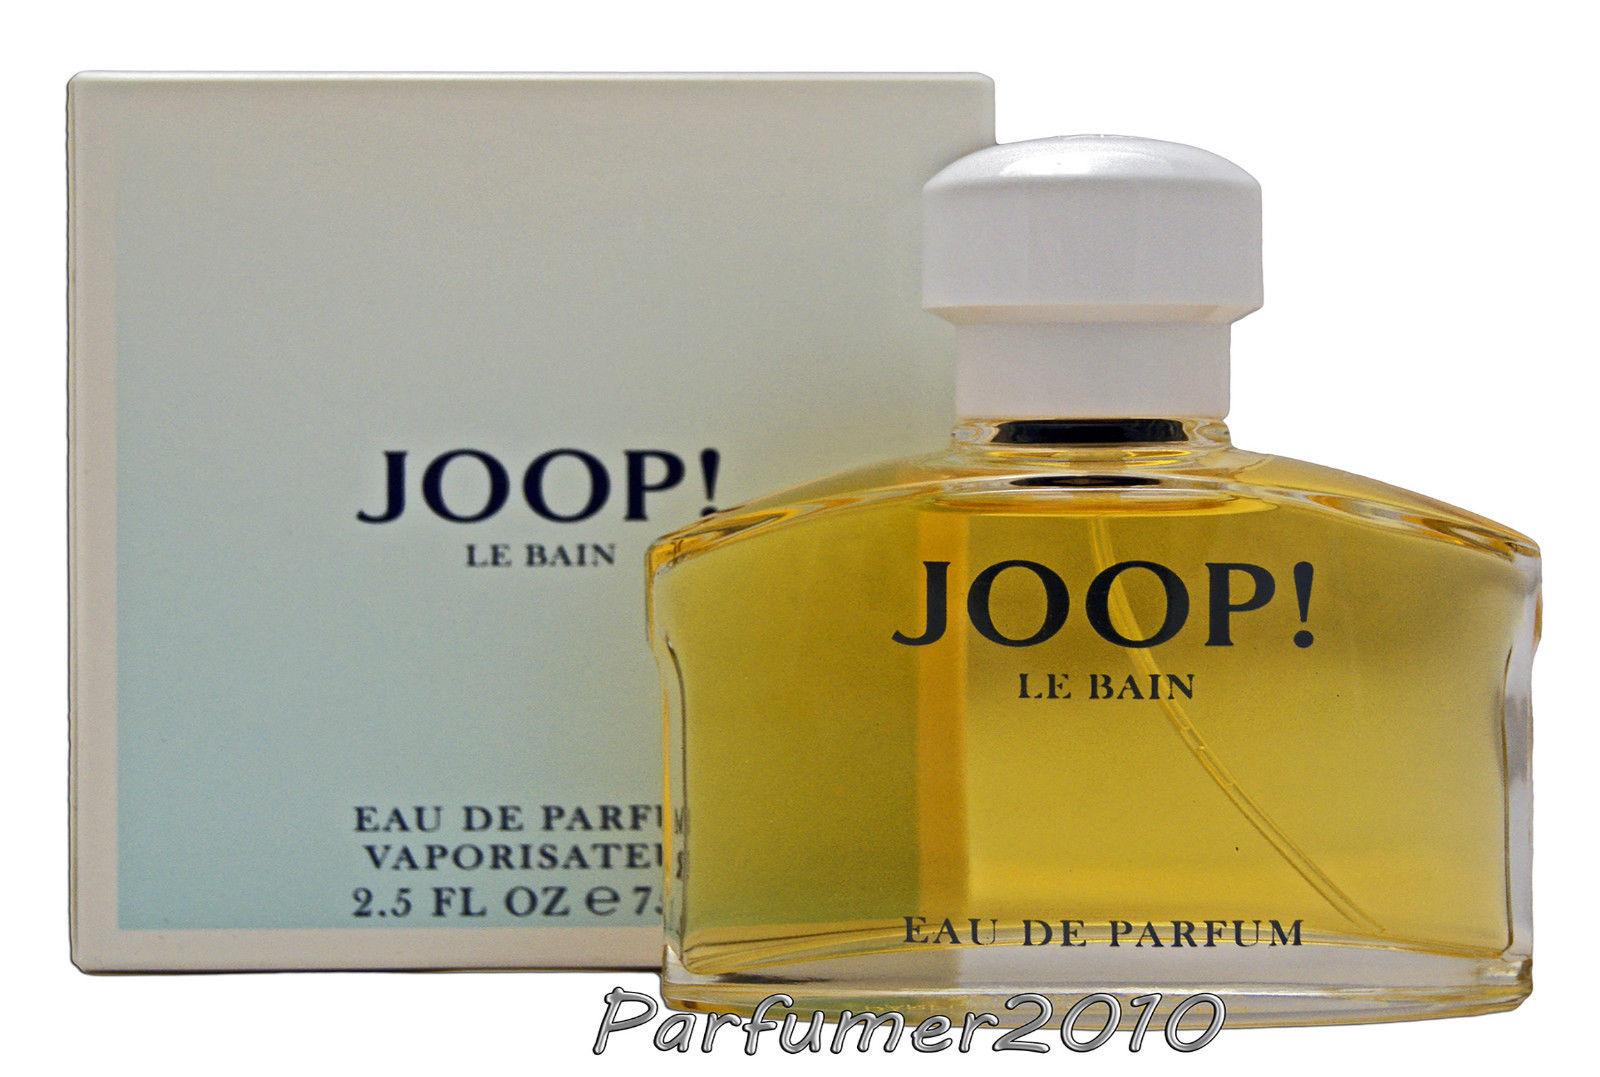 Joop Le Bain 75ml Eau de Parfum EDP Spray Neu&Originalverpackt